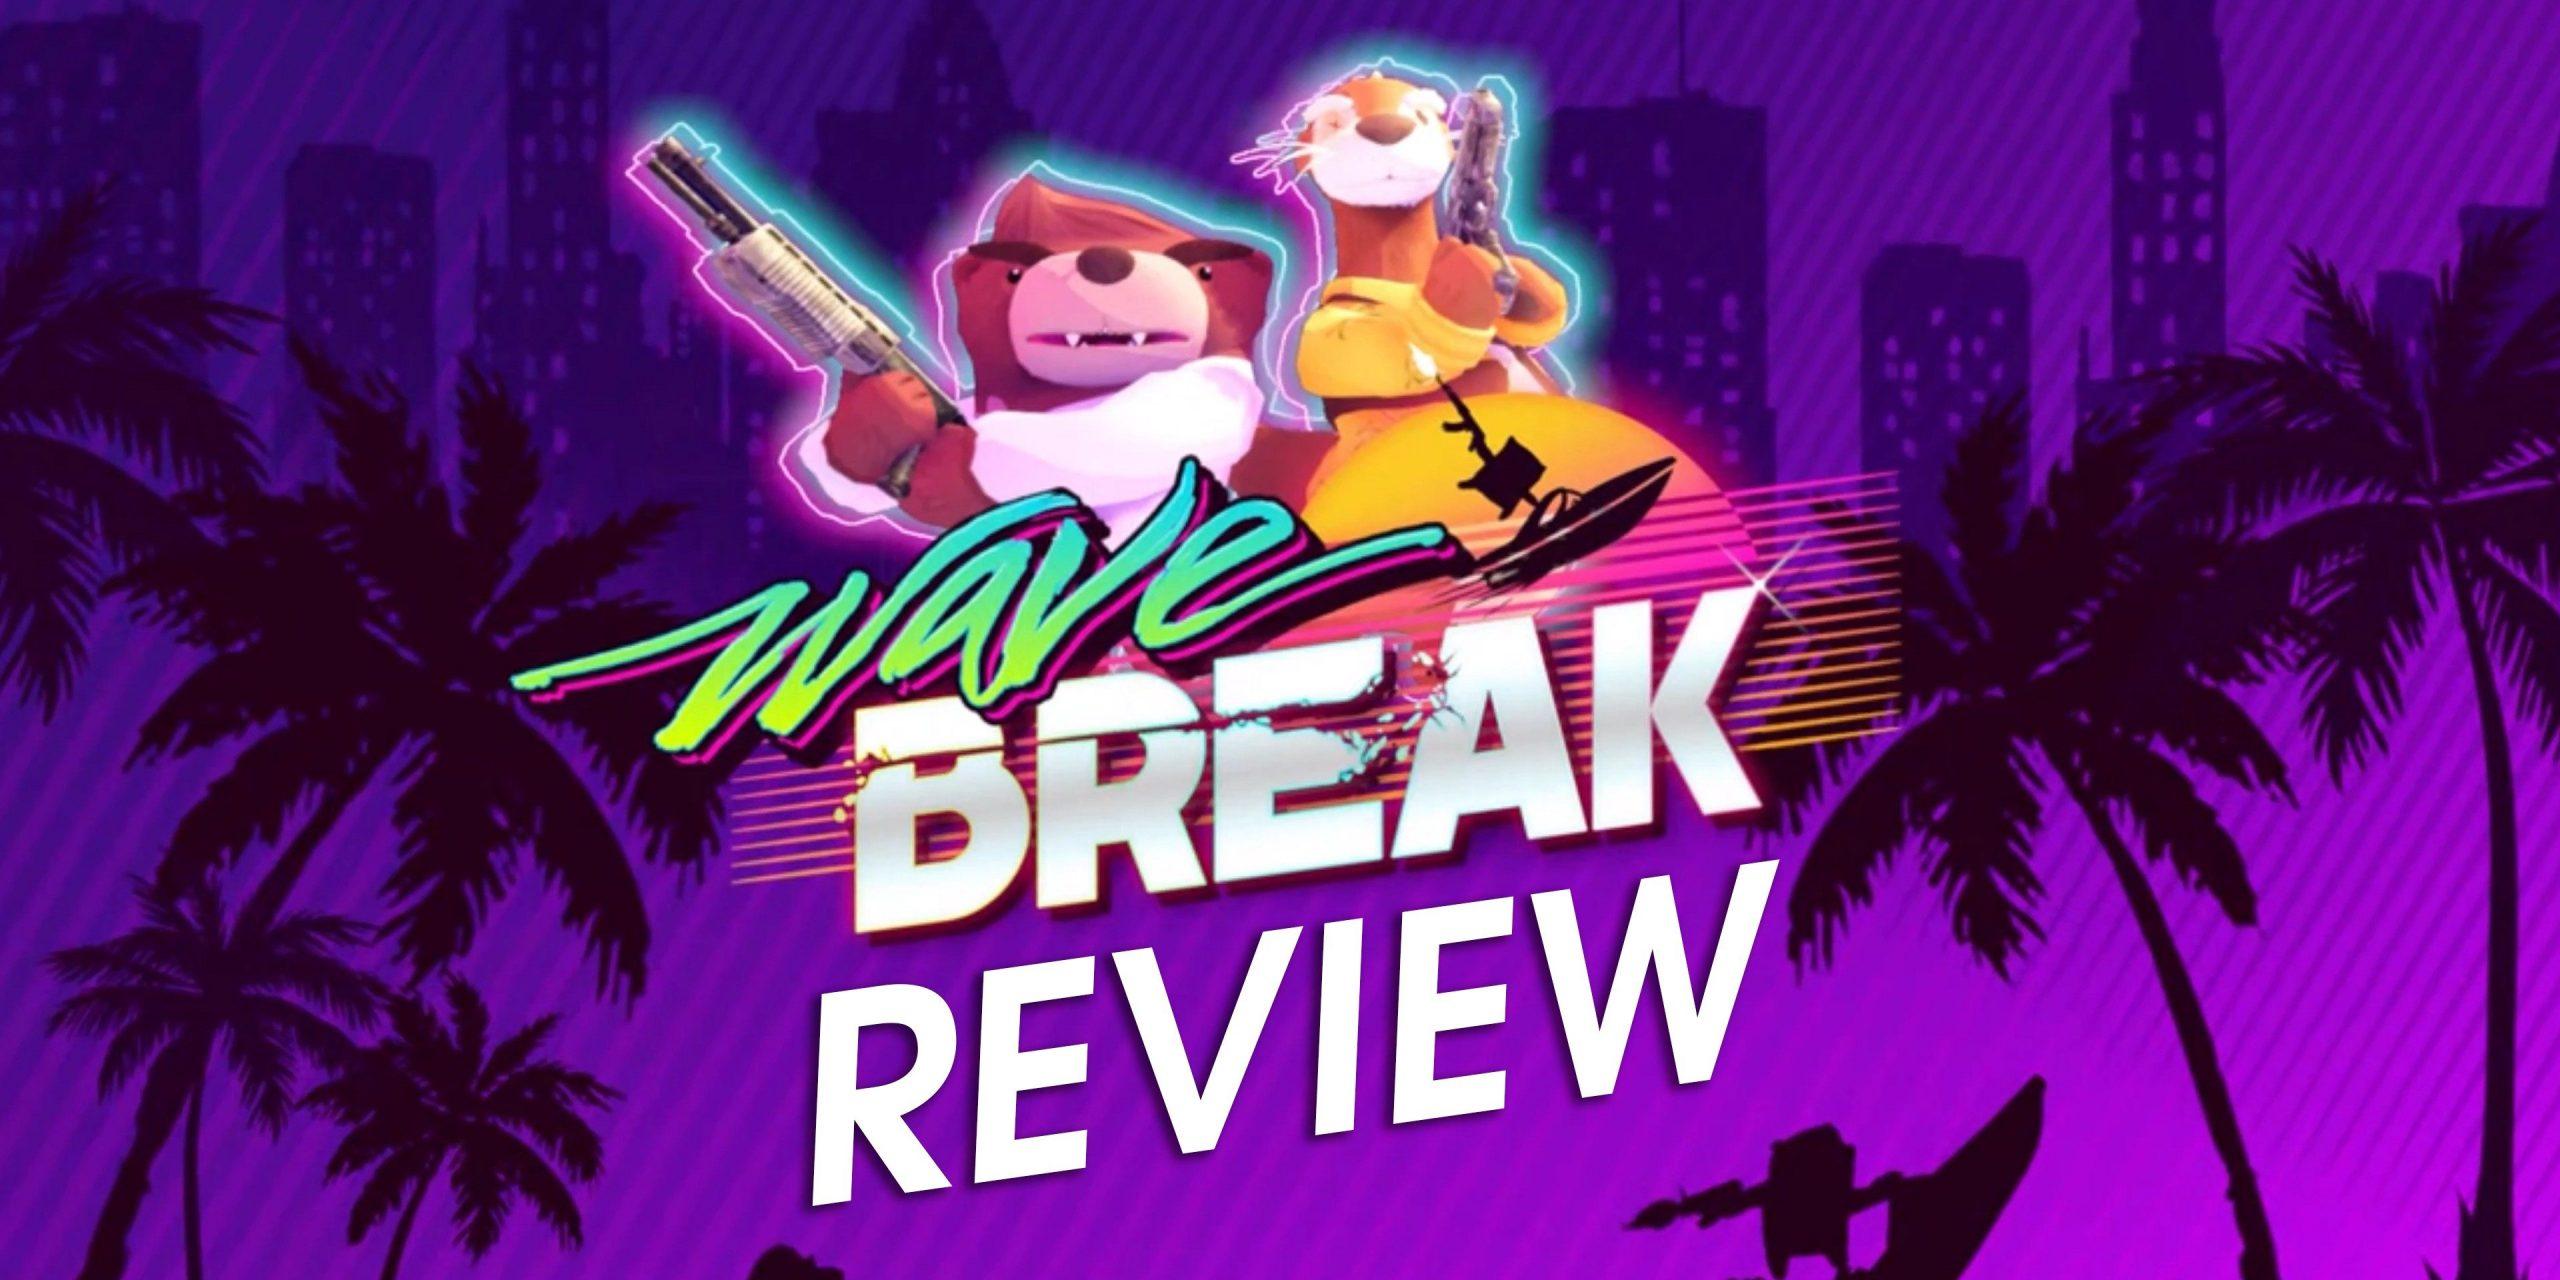 Wave Break para Google Stadia review: radical, brutal, desajeitado [Video]